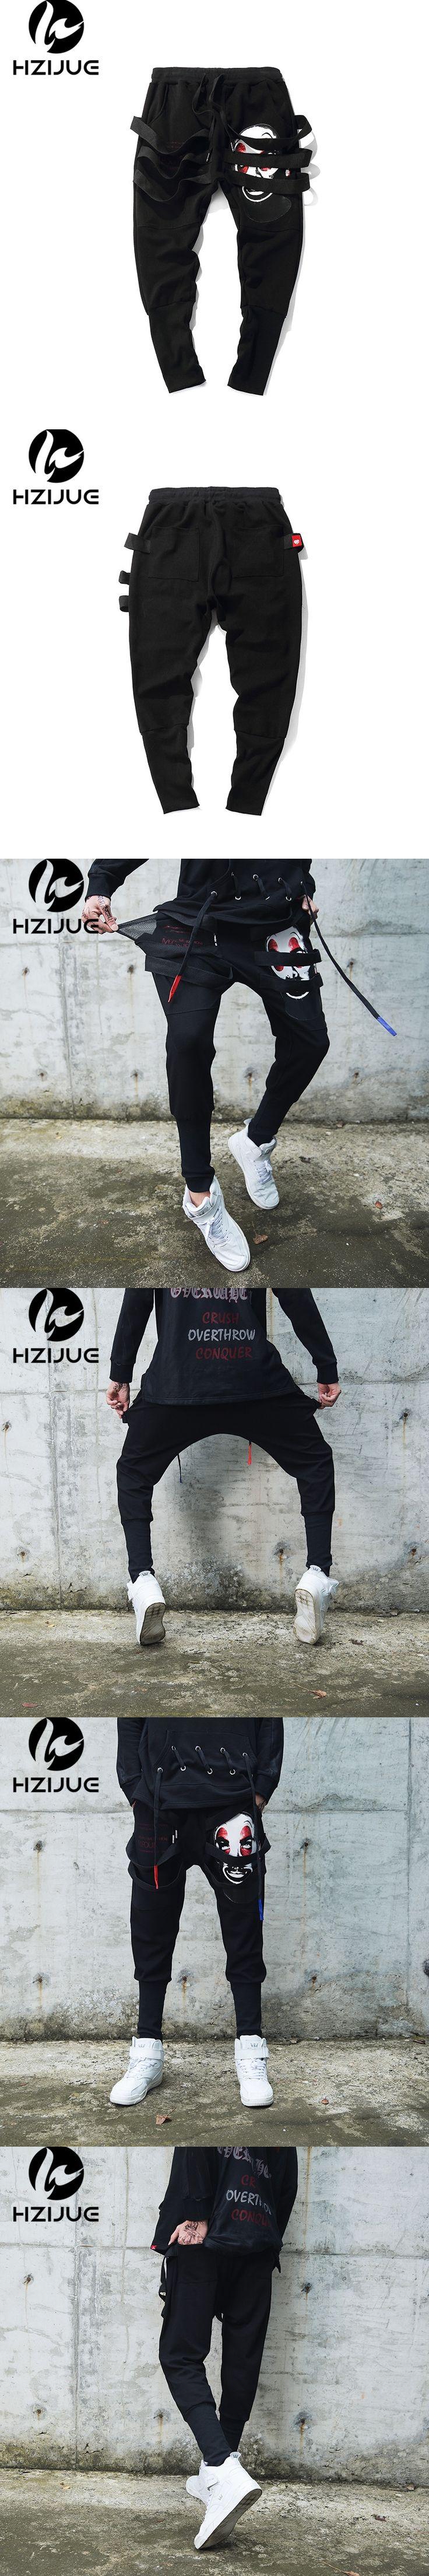 HZIJUE 2017 Ripped Frayed Pants Mens Skinny New Cotton Full Length Pants Hip Hop Black Men Joggers Pants Casual High SweatPants